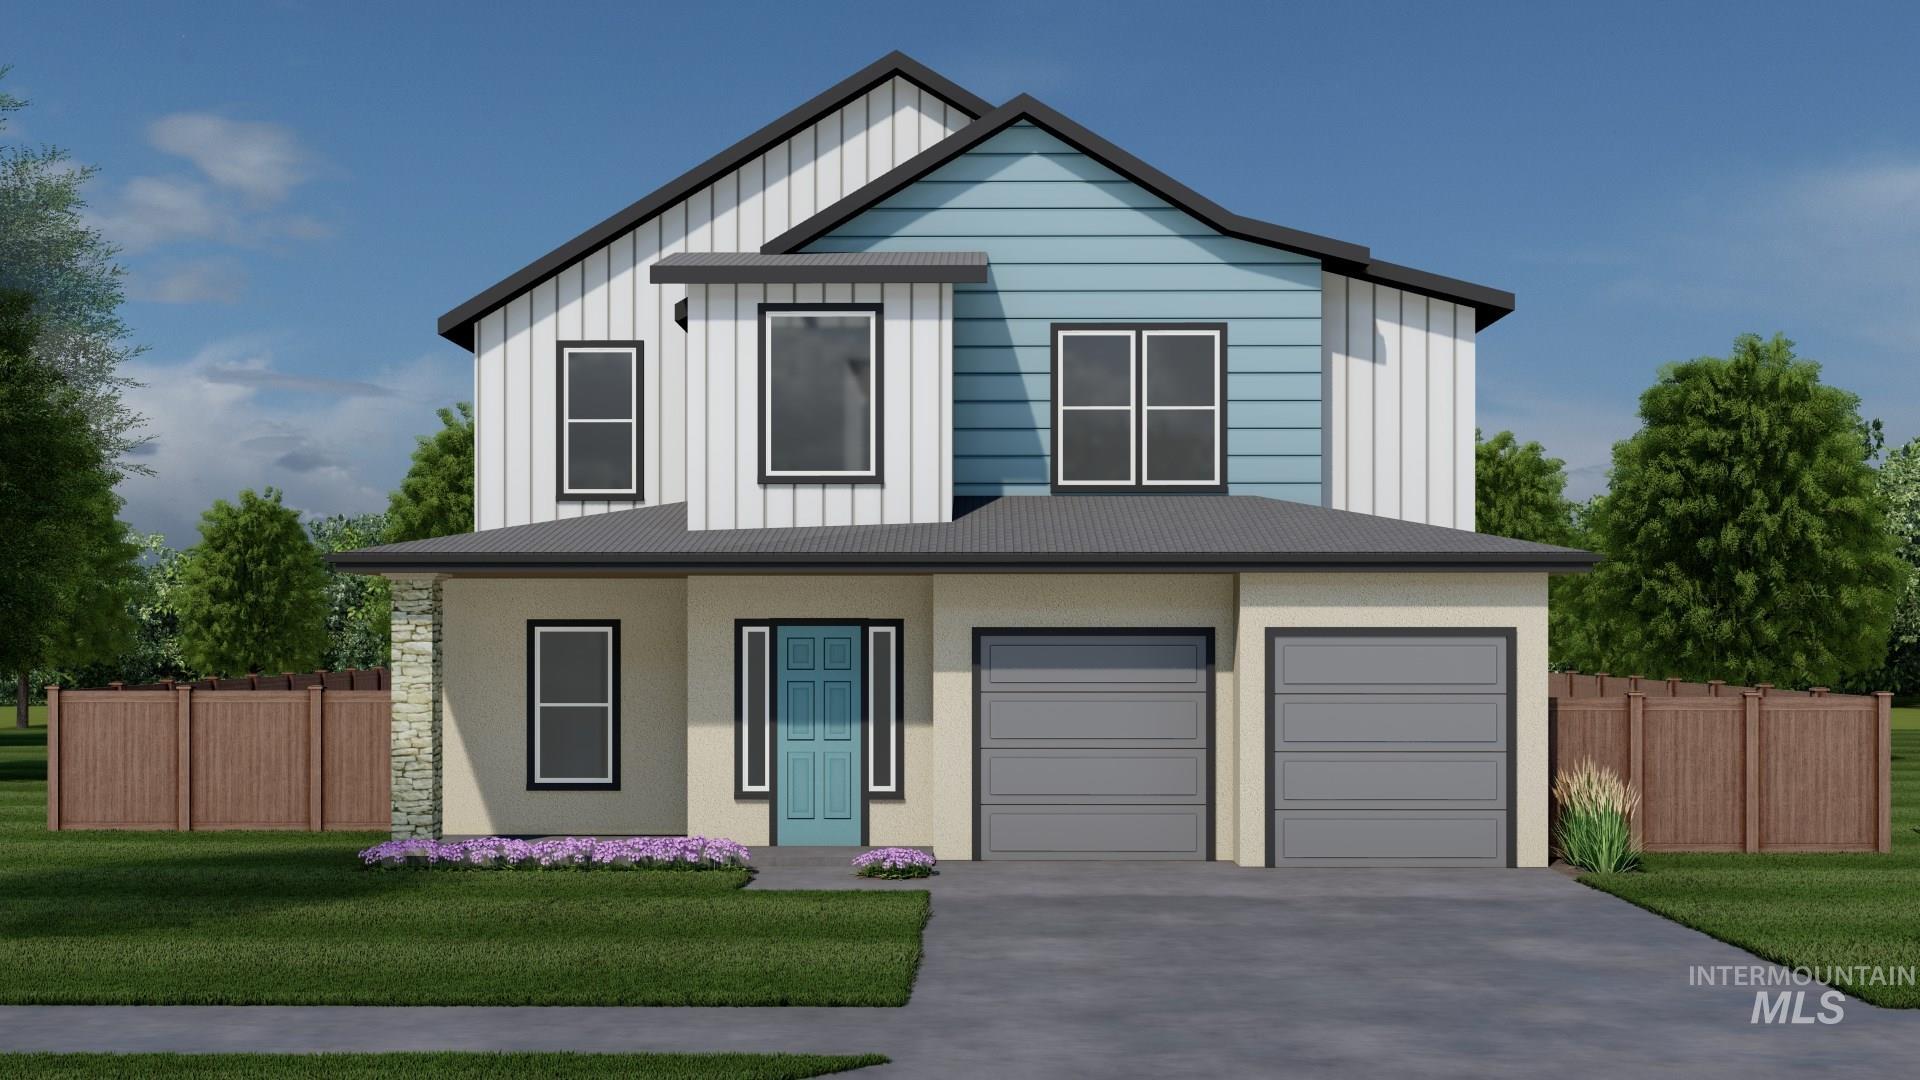 2894 W Neff St Property Photo - Boise, ID real estate listing